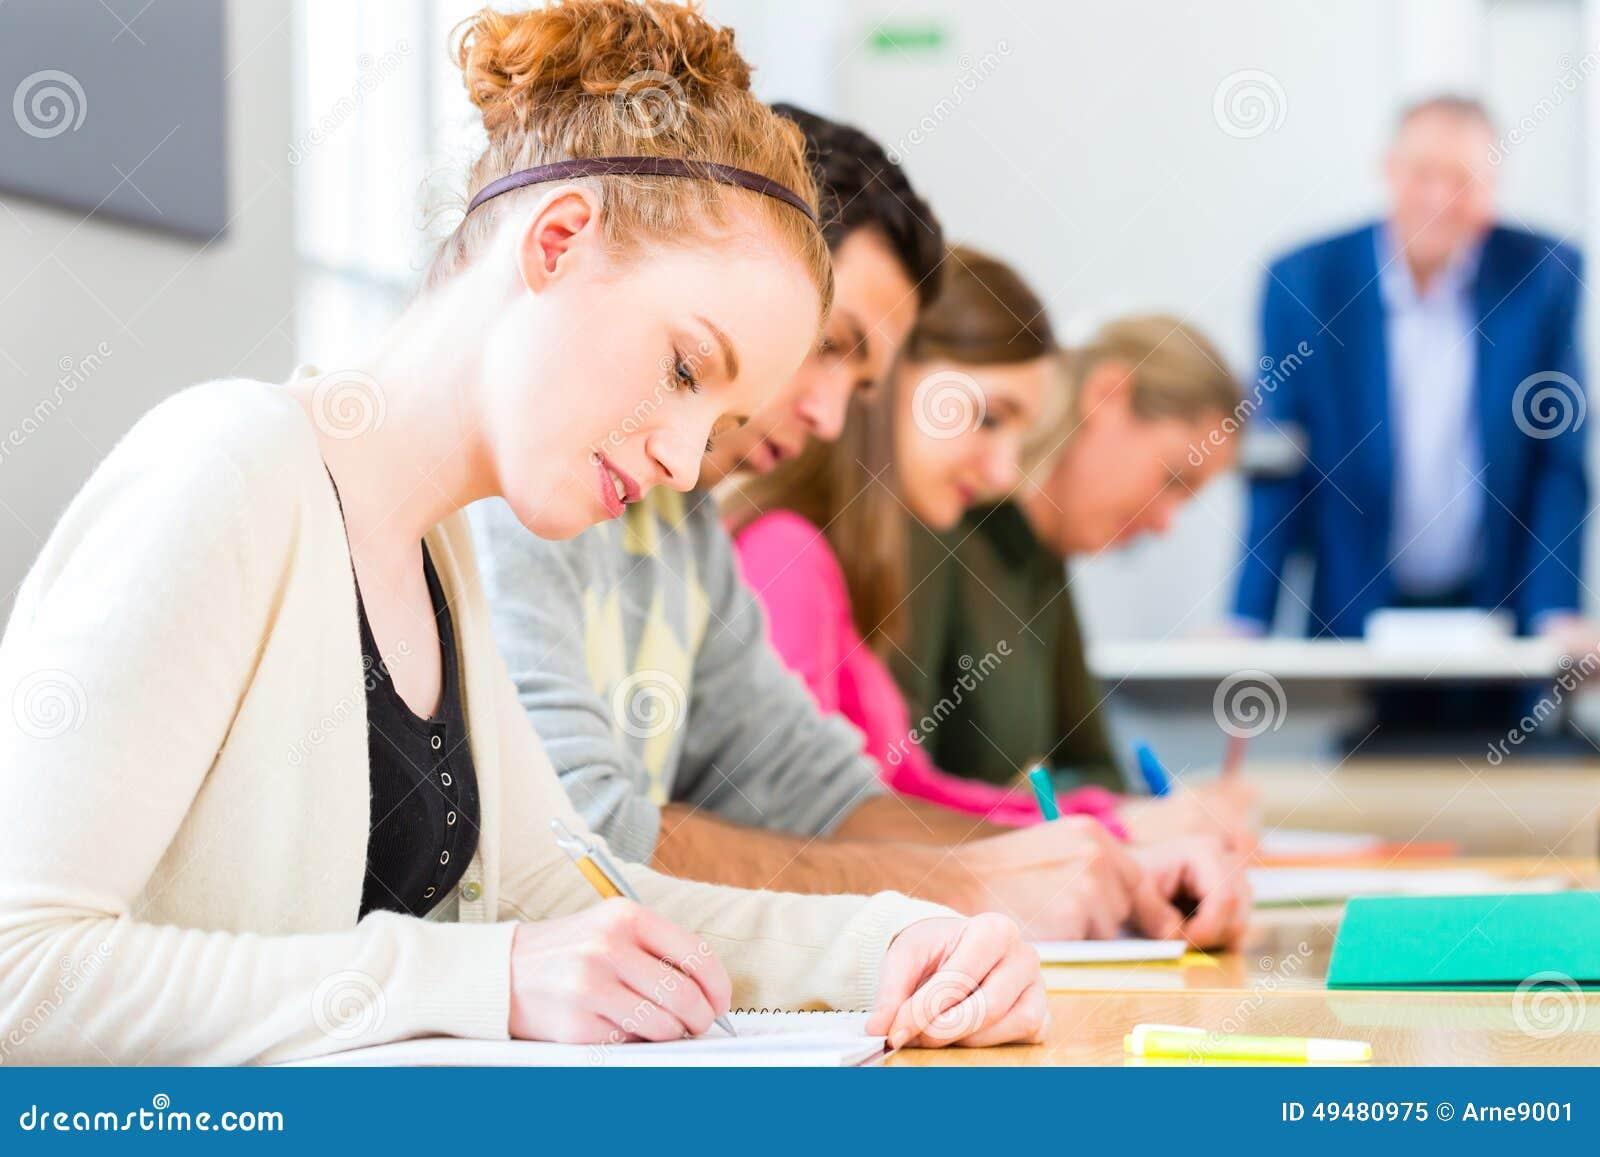 Studenci collegu pisze tescie lub egzaminie